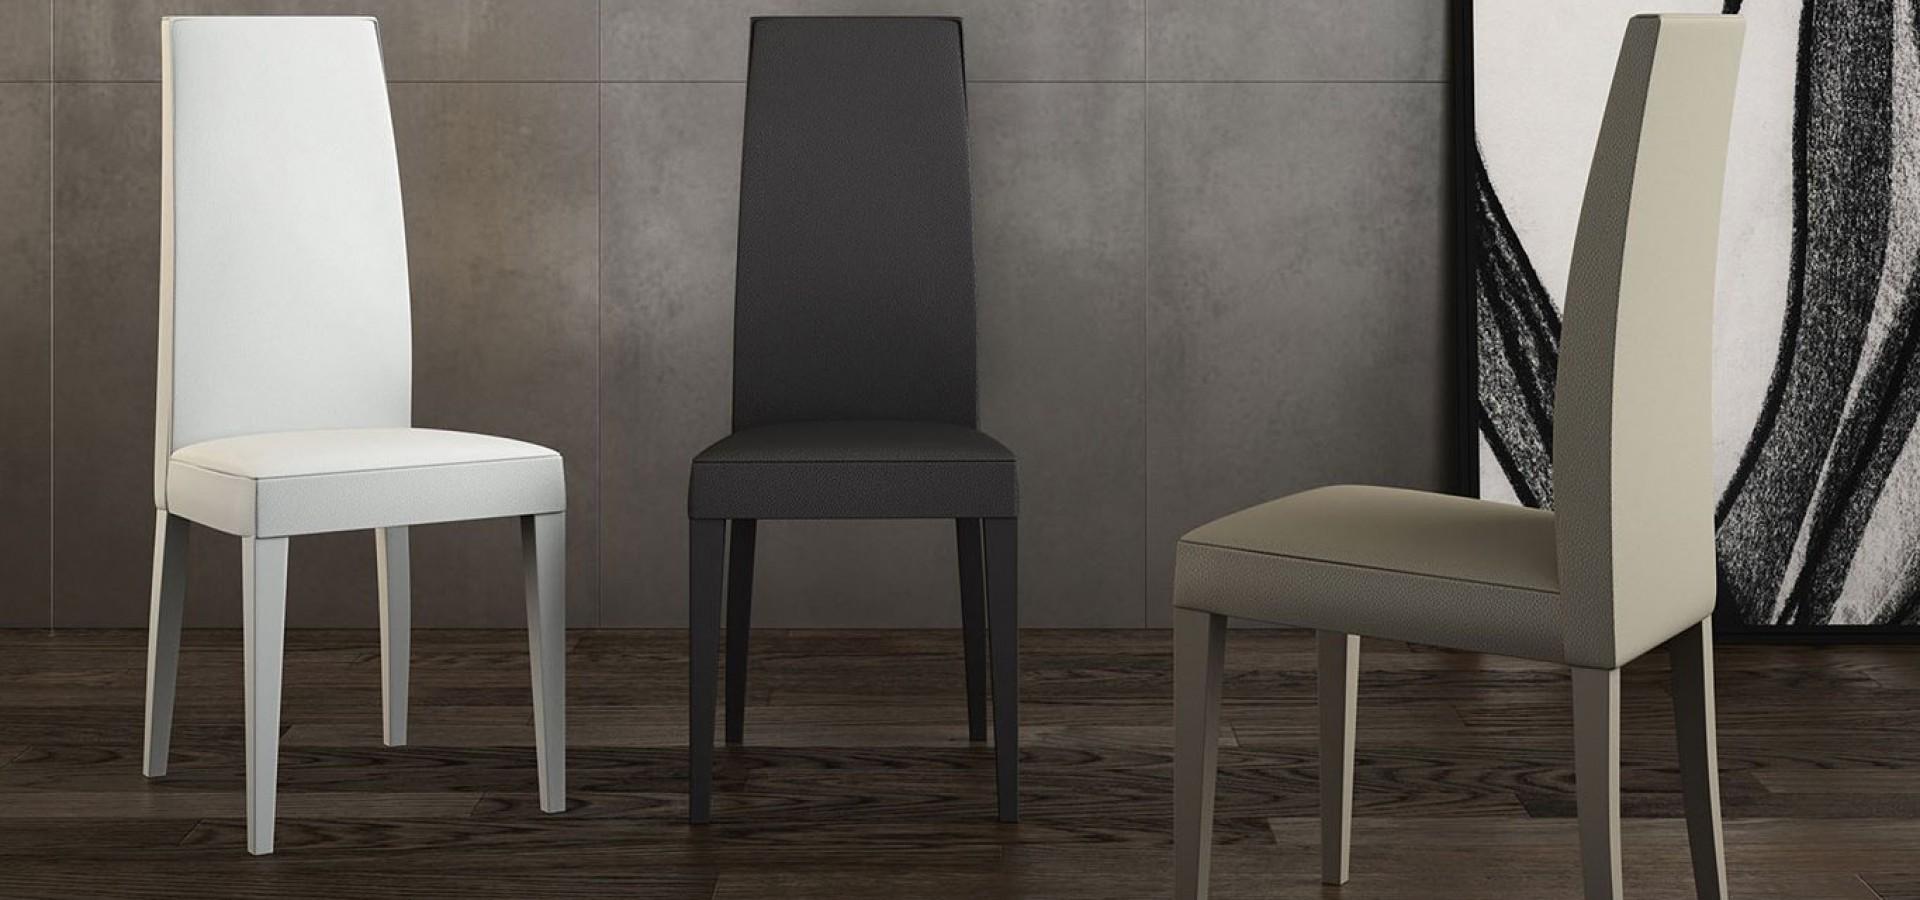 Итальянский стул Стул Carmen | Стул Стул Carmen ARREDO3